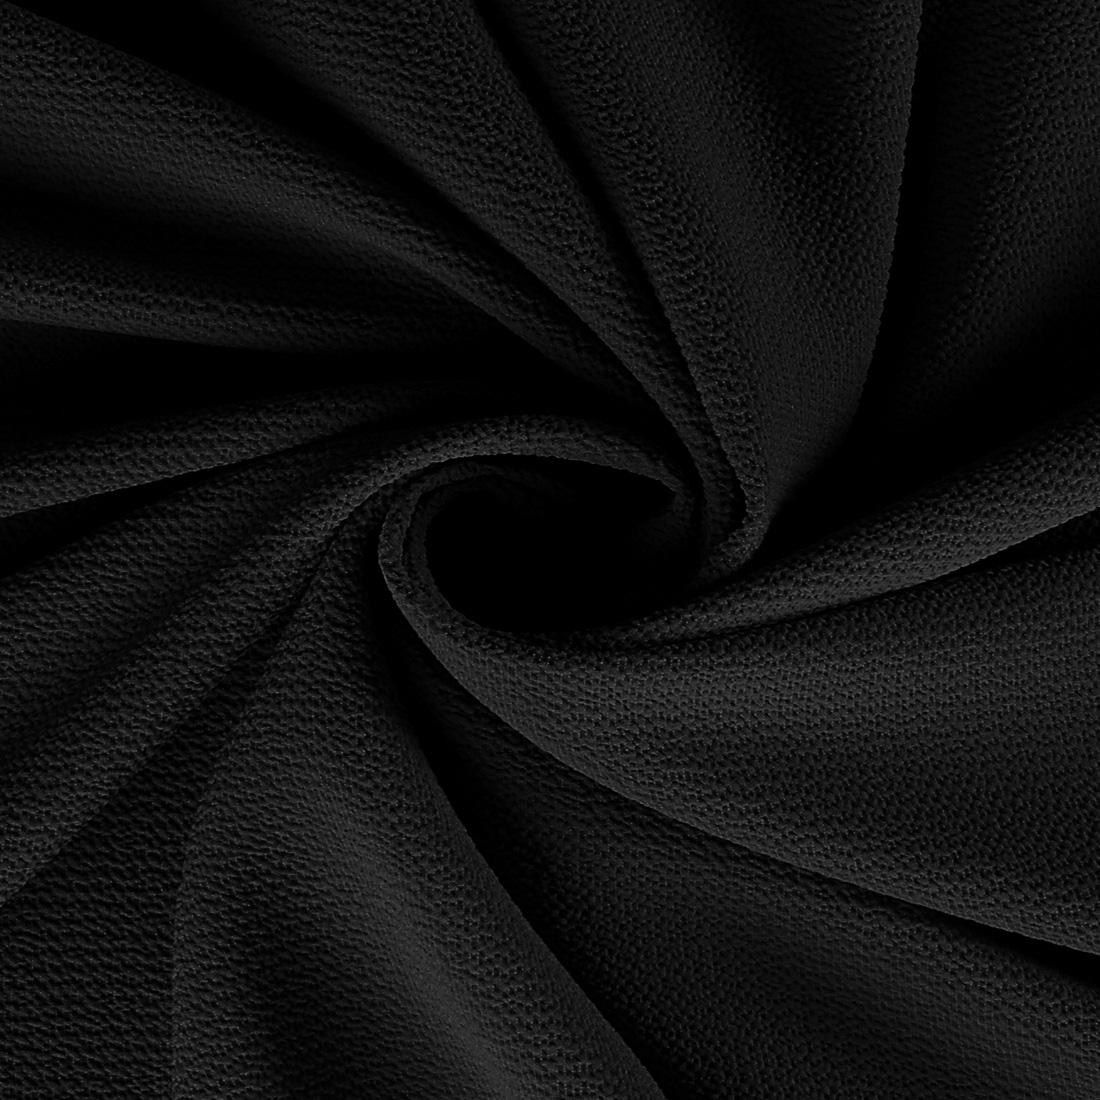 Pebble Crepe Black